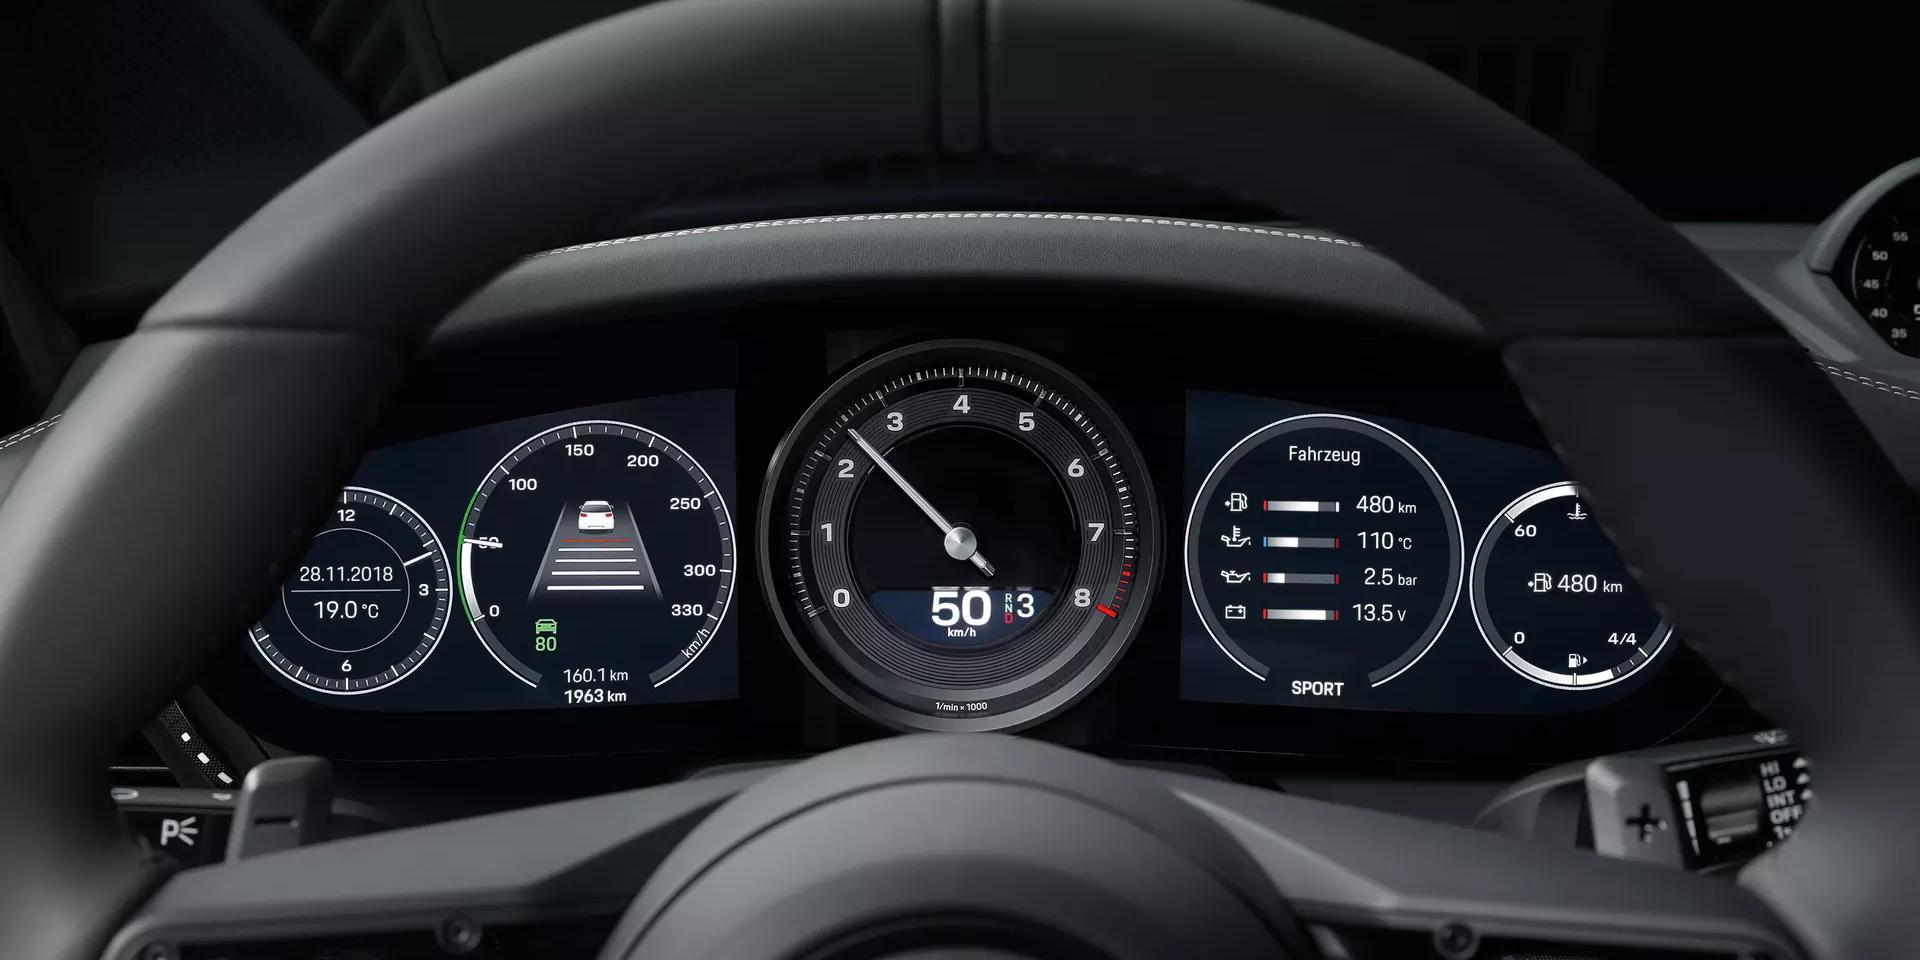 2020 Porsche 911 Performance